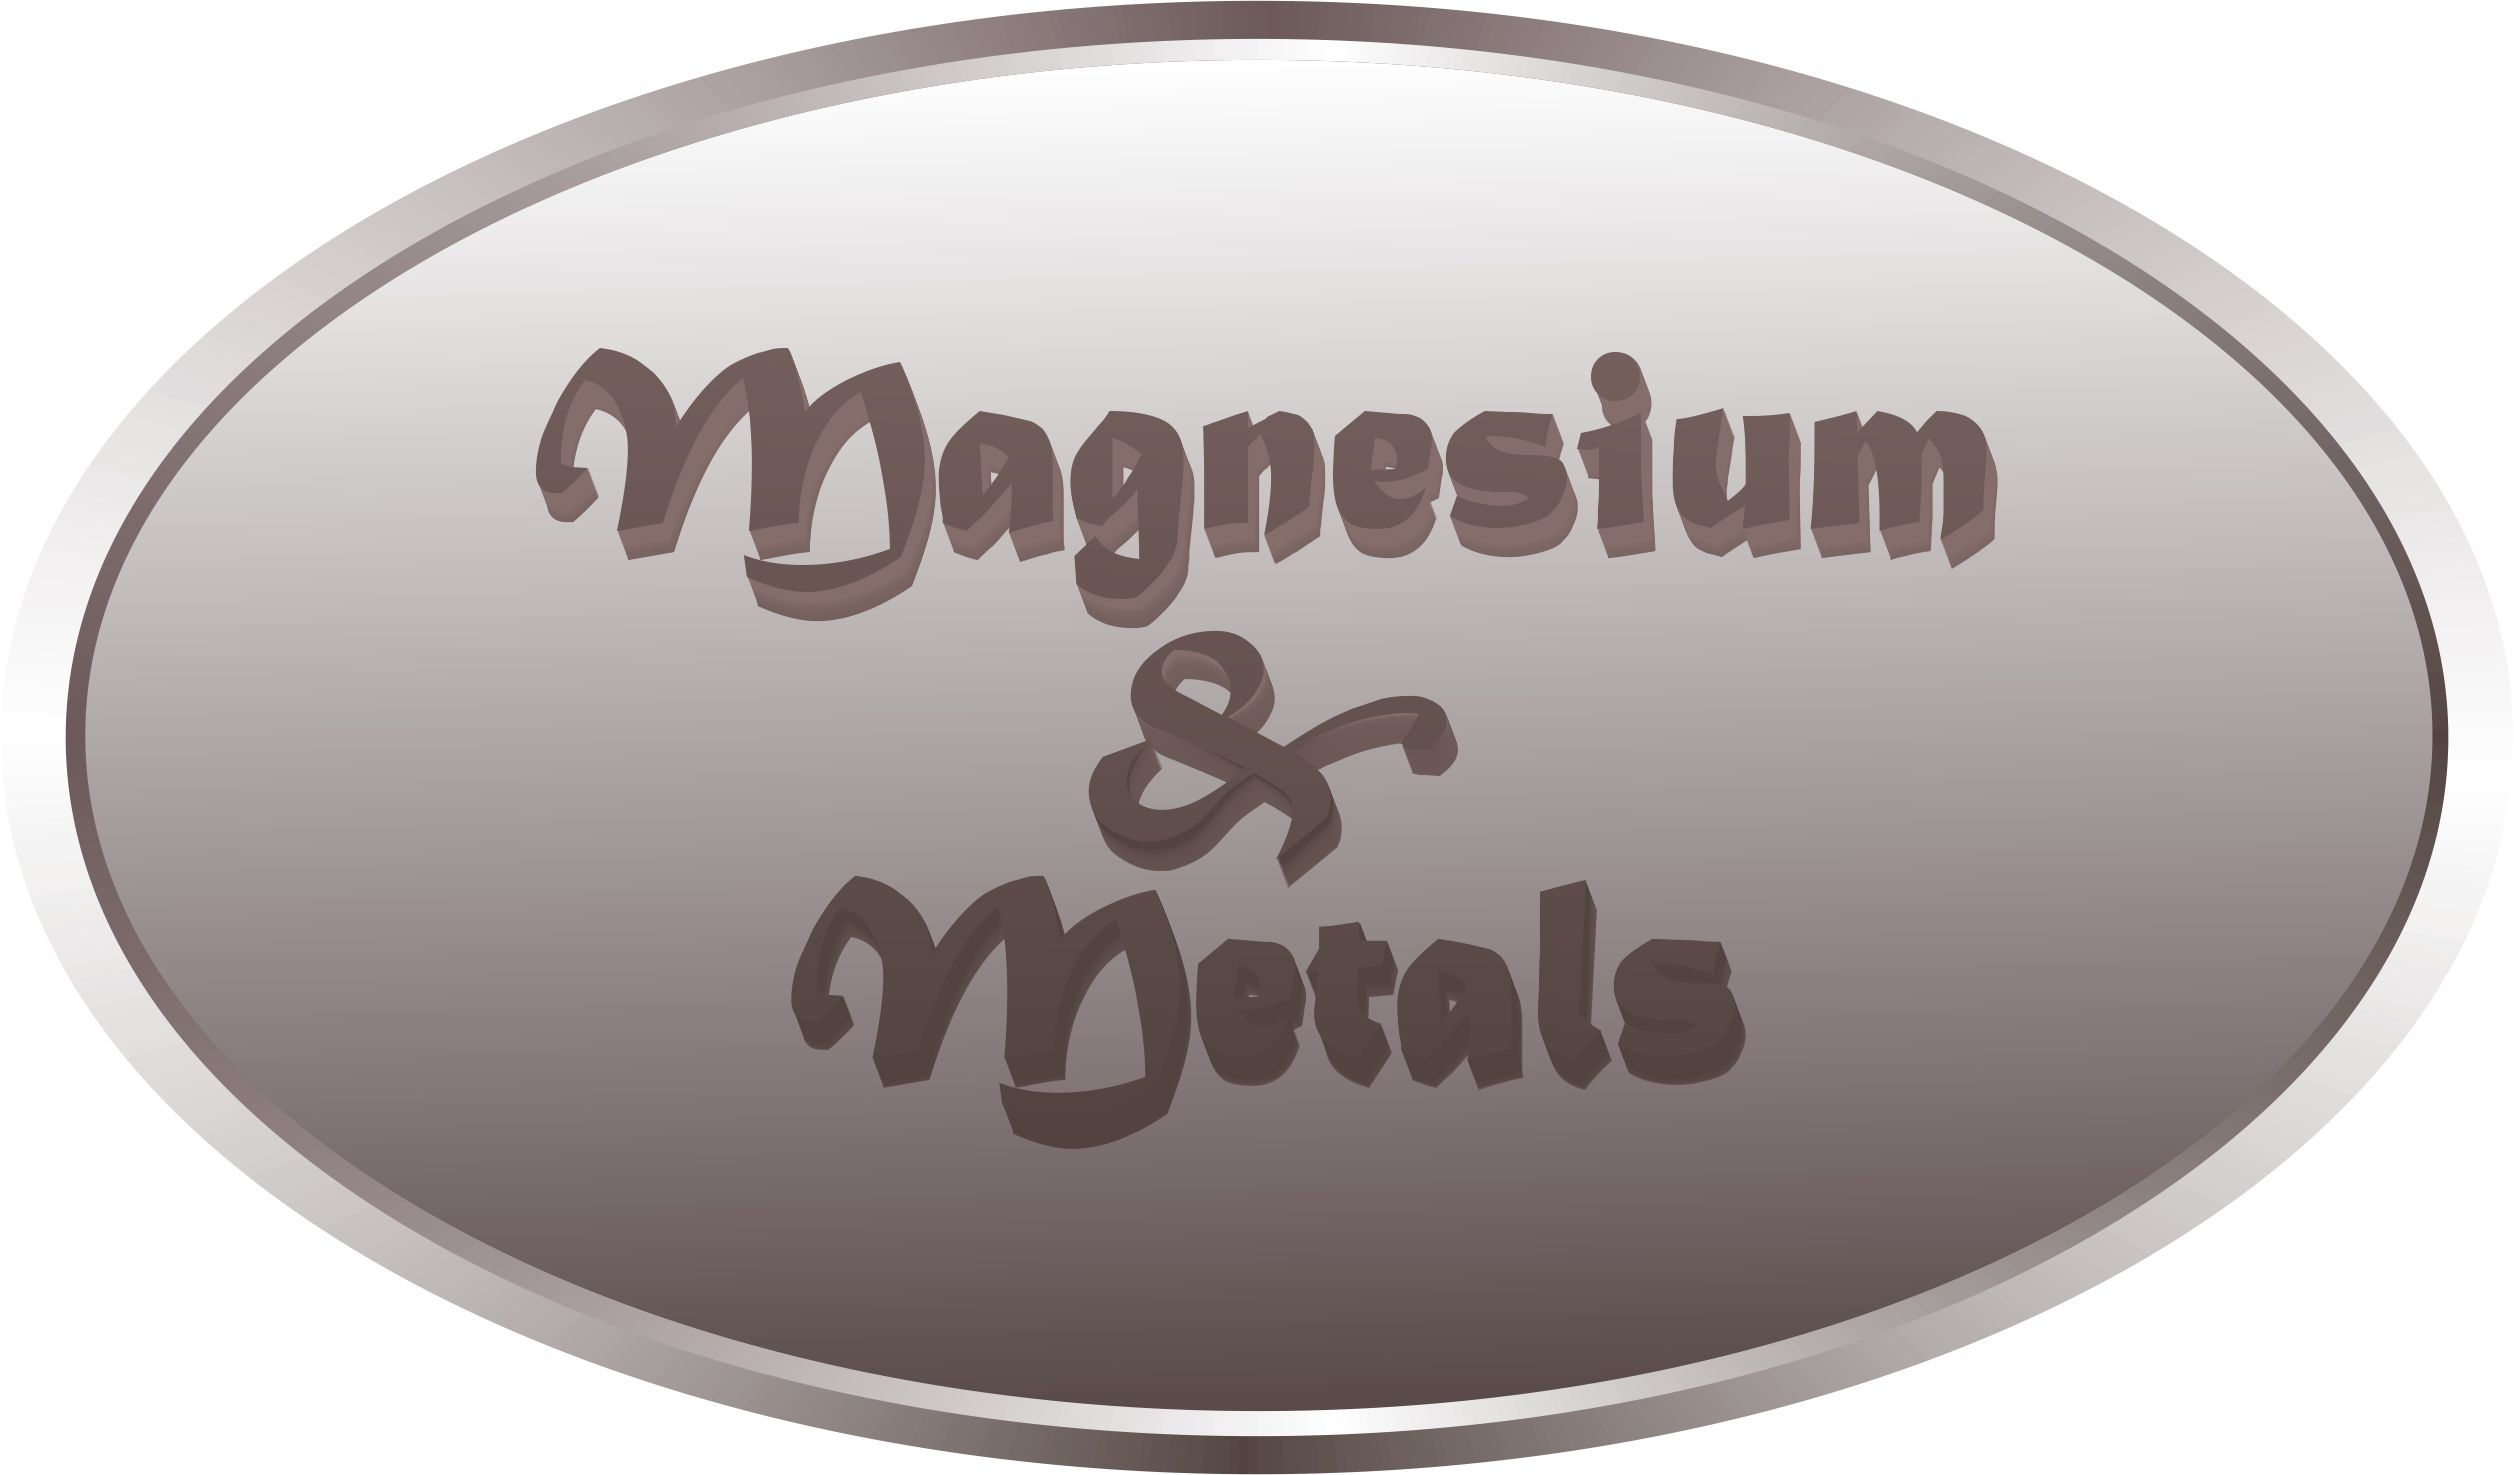 Логотип для проекта Magnesium&Metals фото f_4e9dae2de8bb5.jpg